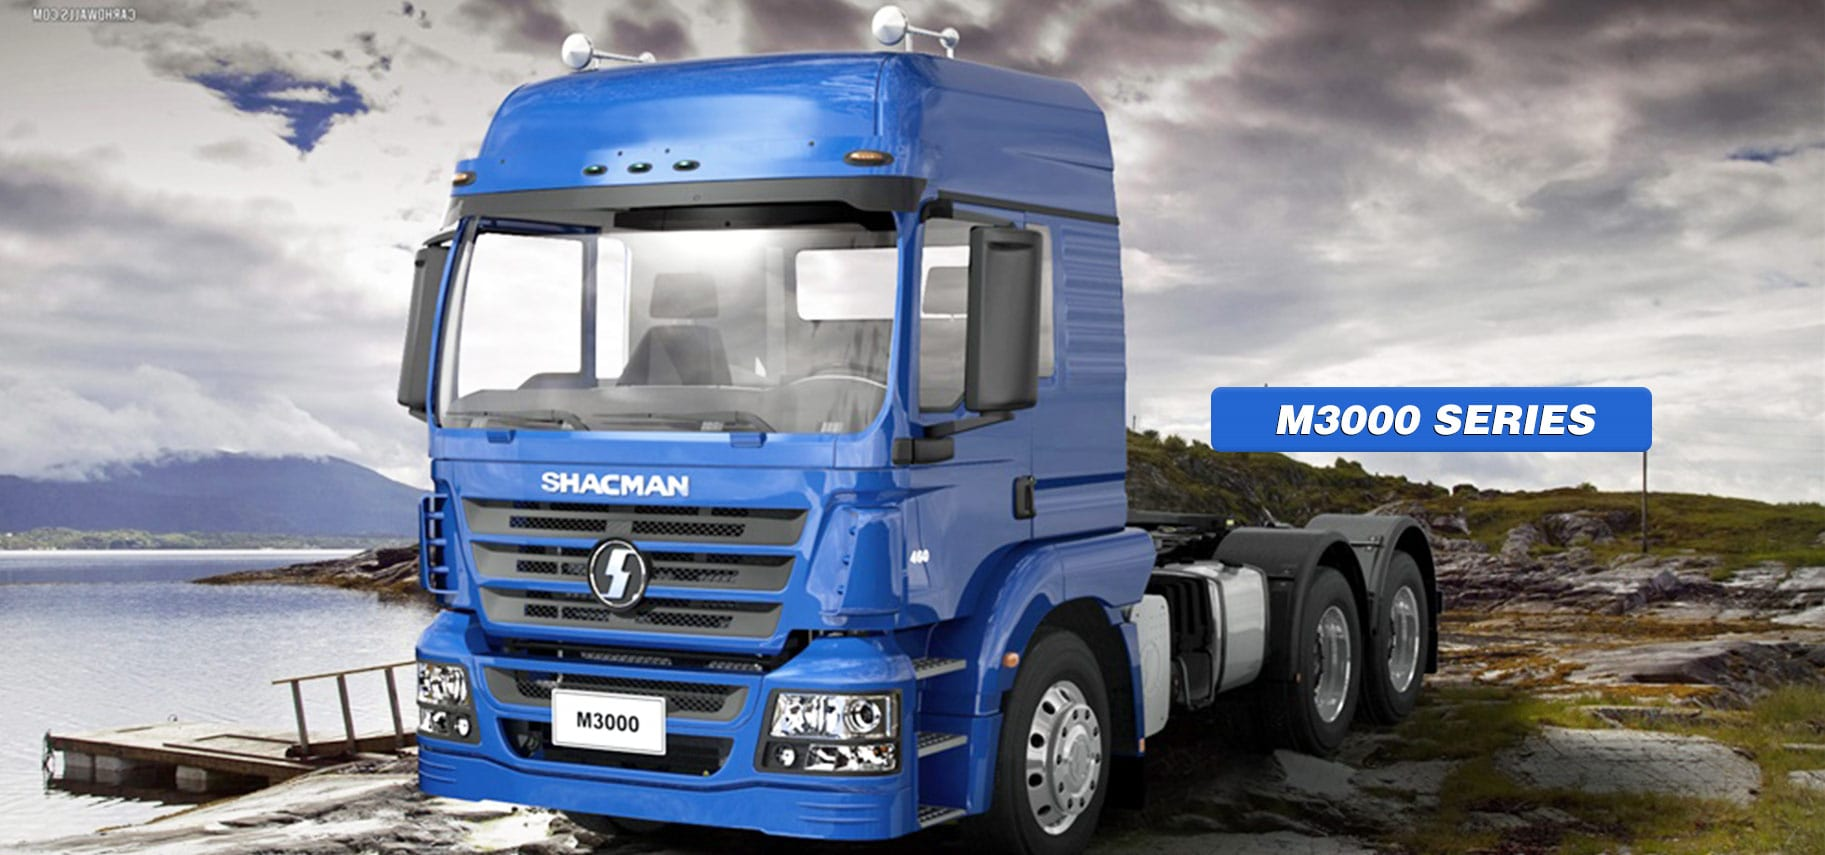 M3000 Series